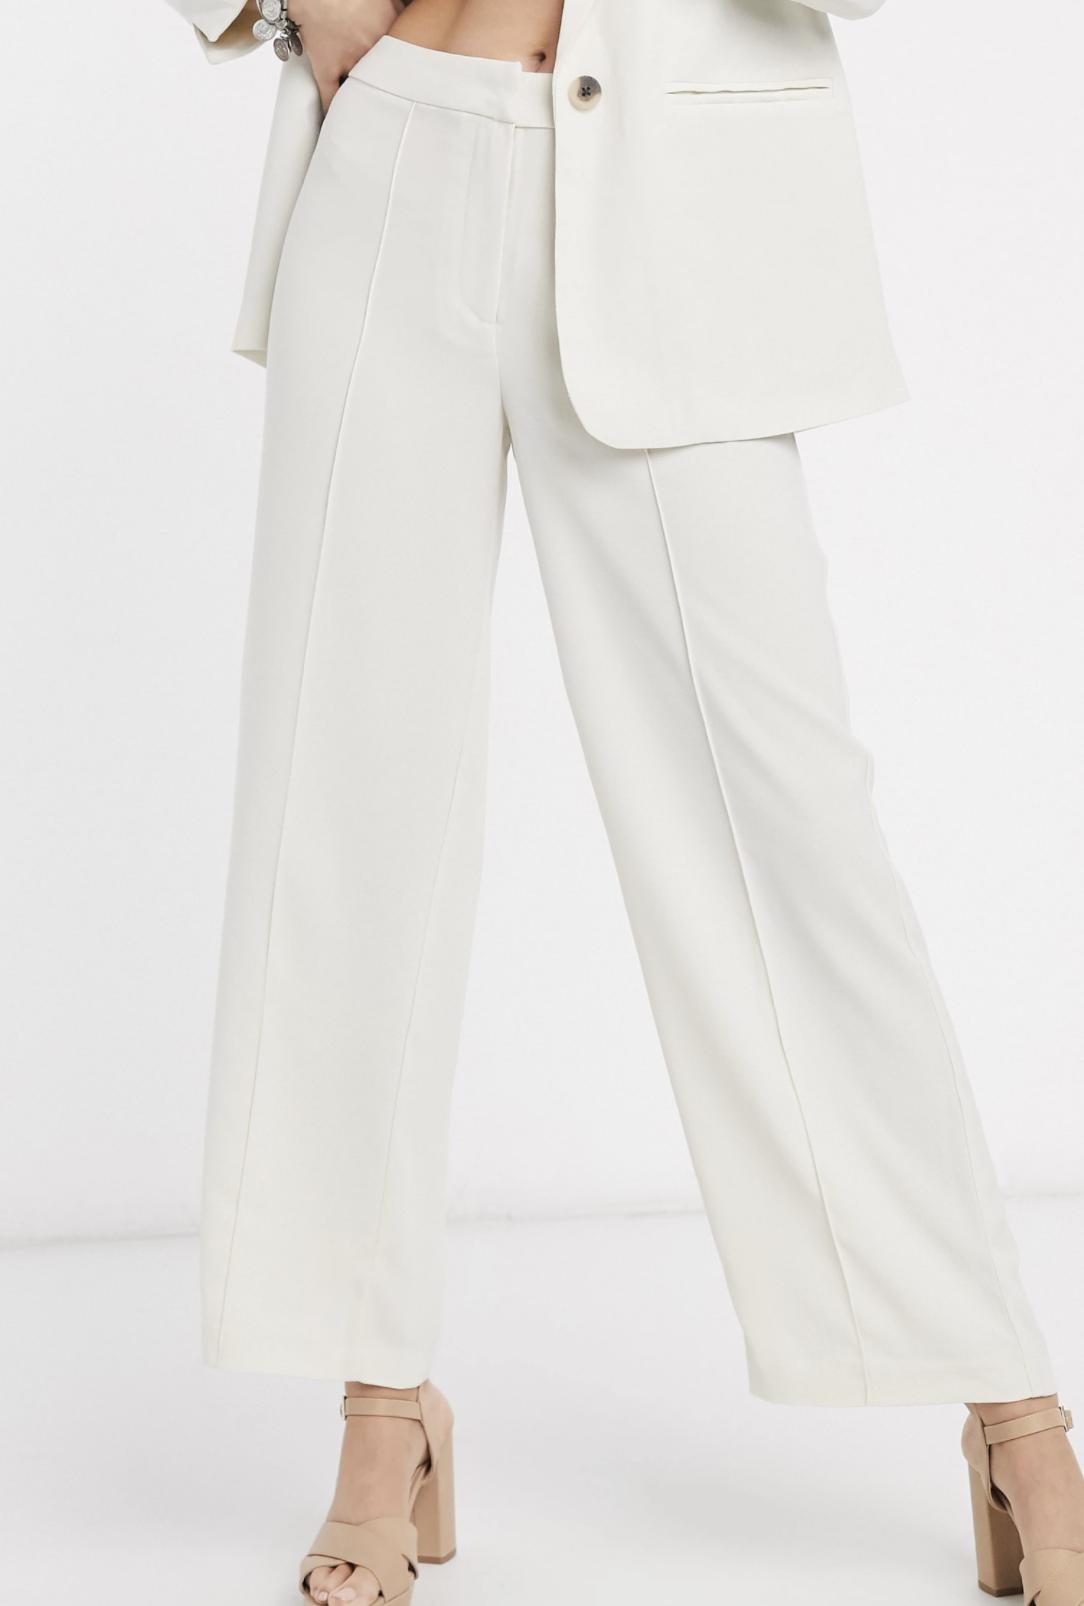 Pantalones de traje de pernera ancha en blanco de Vila